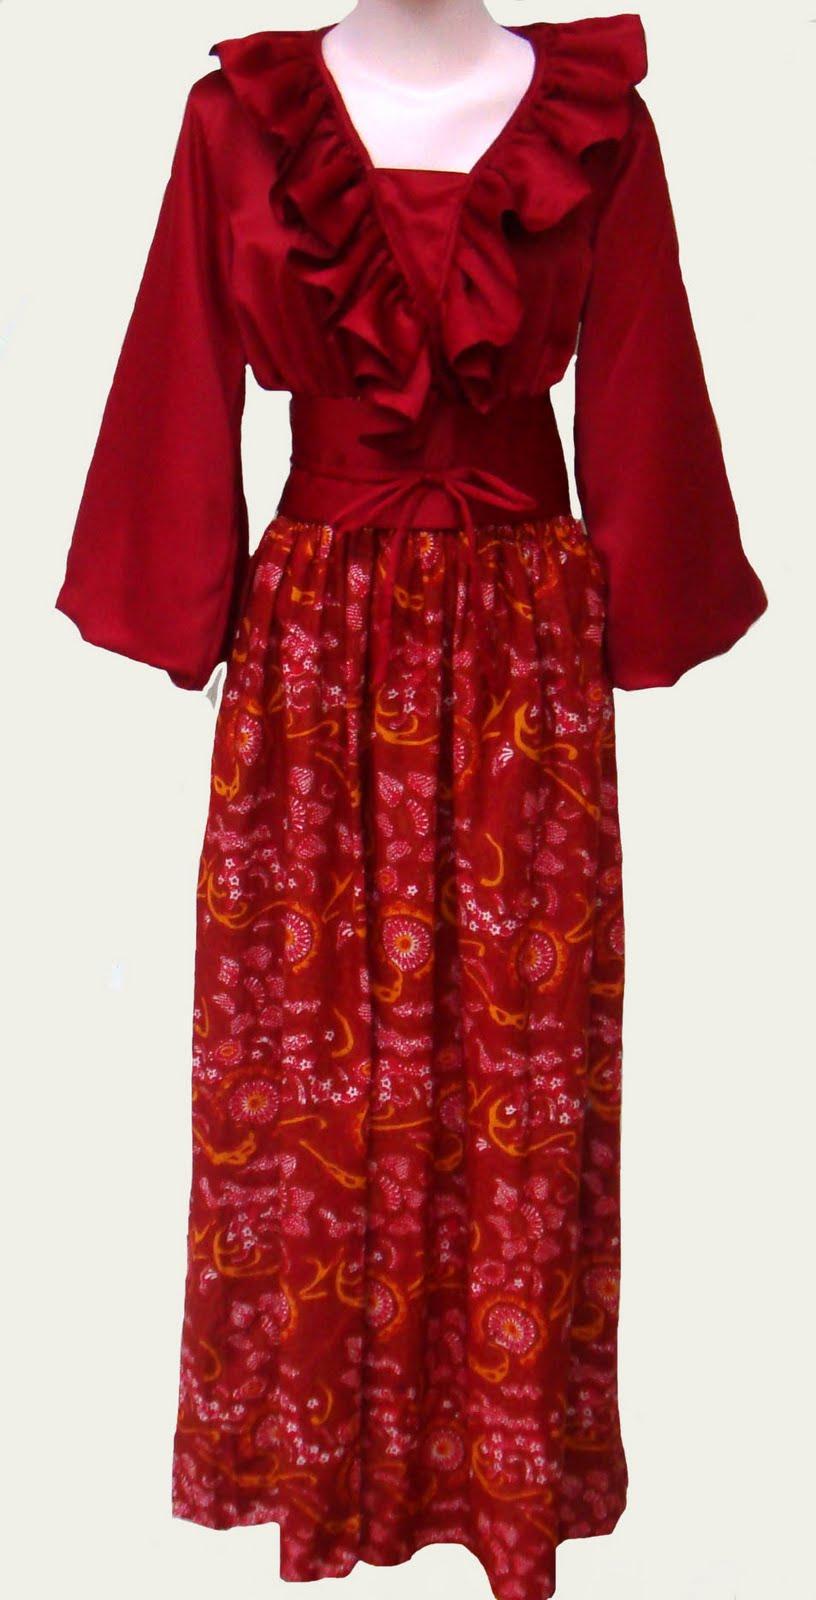 Busana Muslimah Ku Gamis Batik Modern